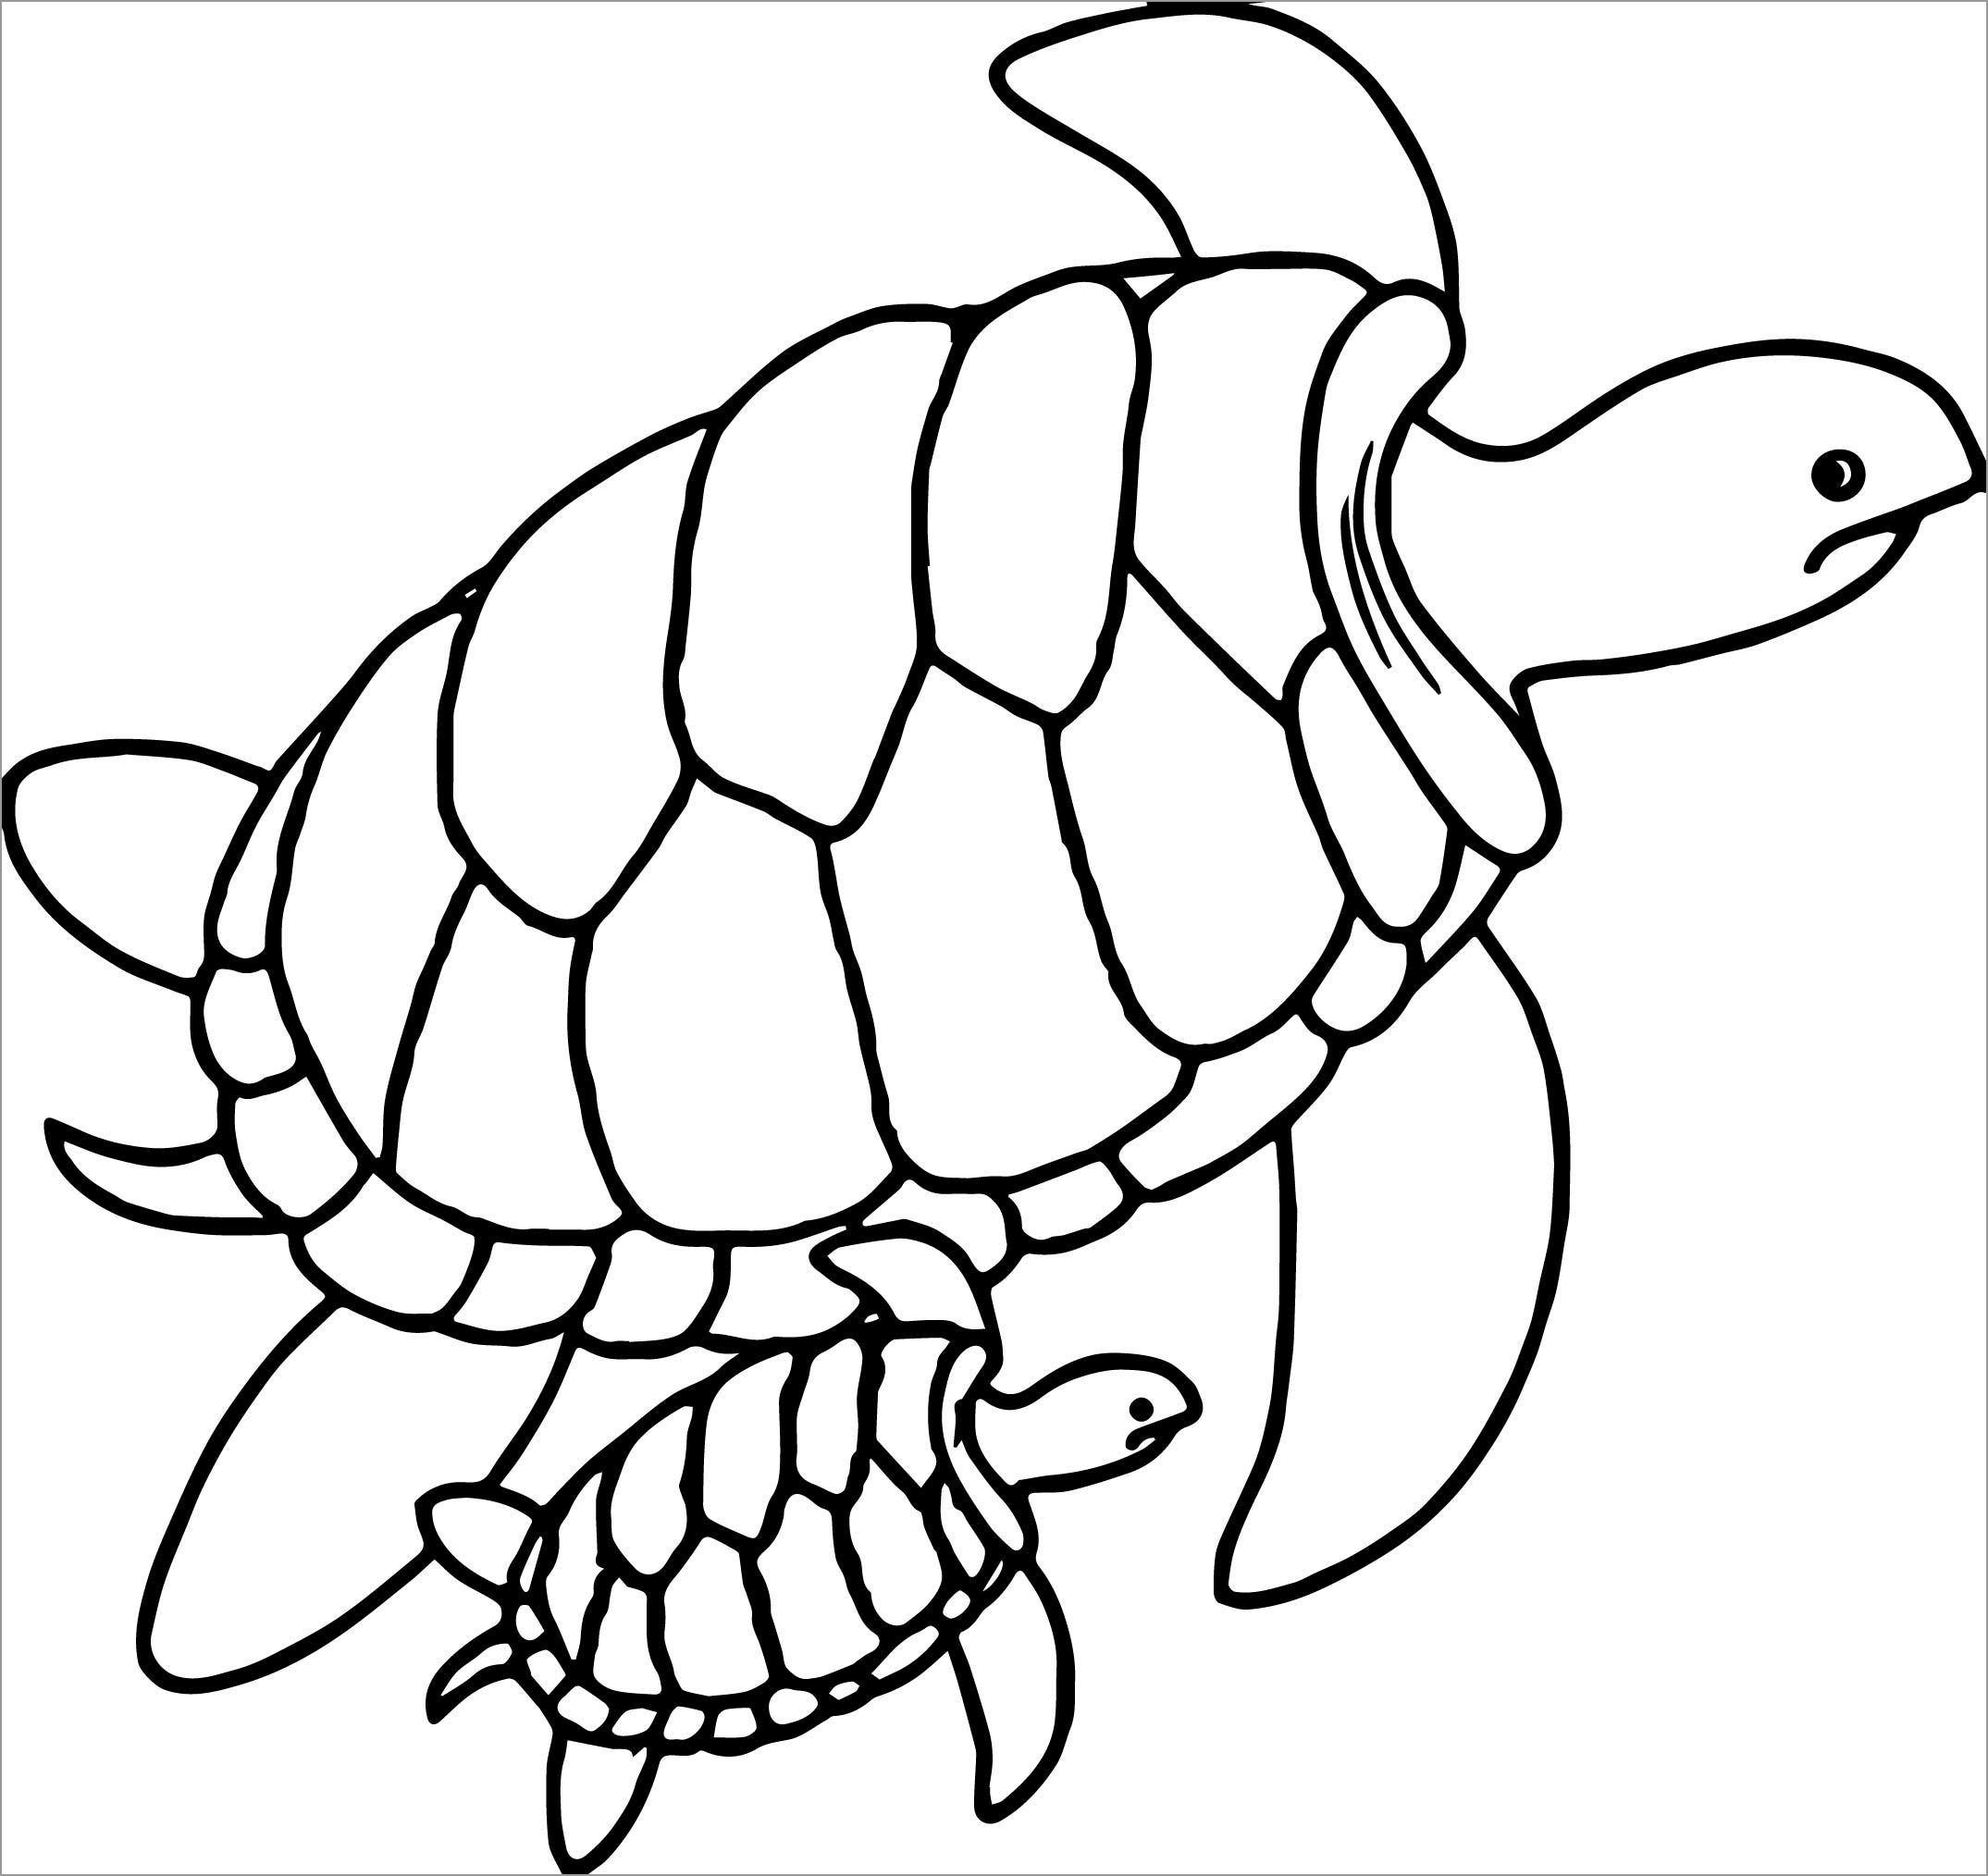 Cute Sea Turtle Coloring Page for Preschool